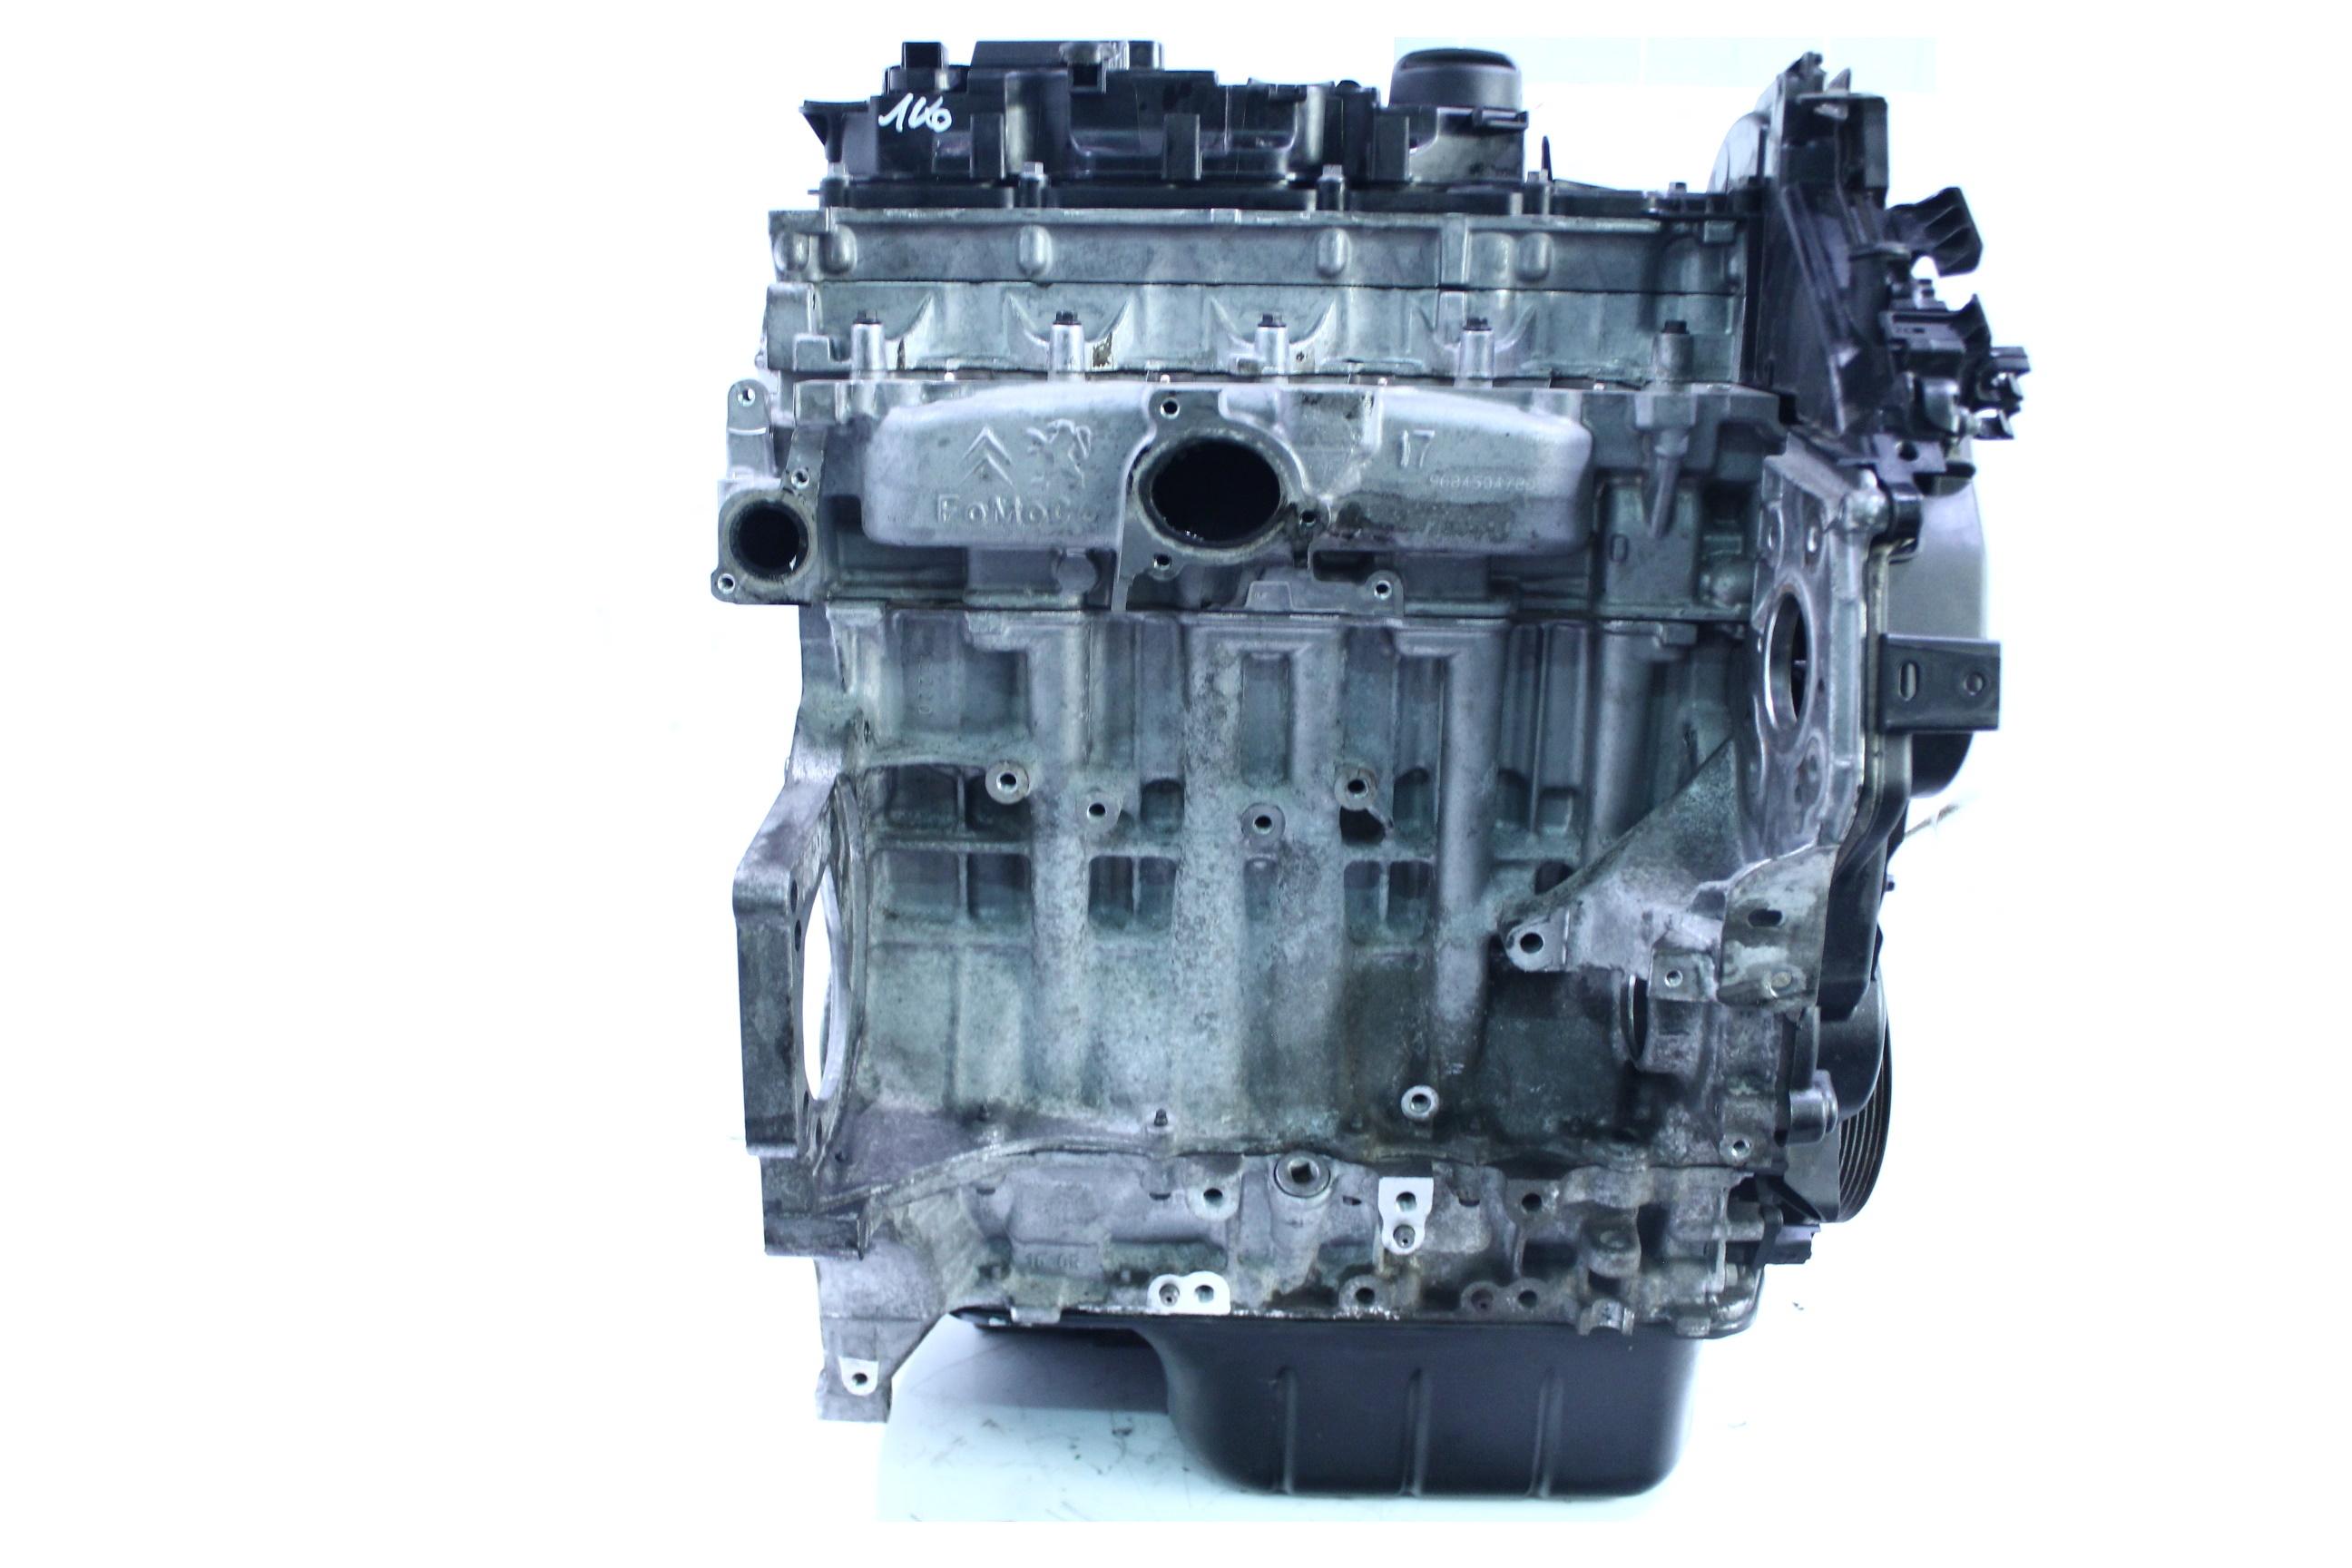 Motor 2014 Citroen Peugeot C3 C4 DS3 DS4 208 1,6 HDi Diesel 9HD DV6C 9H05